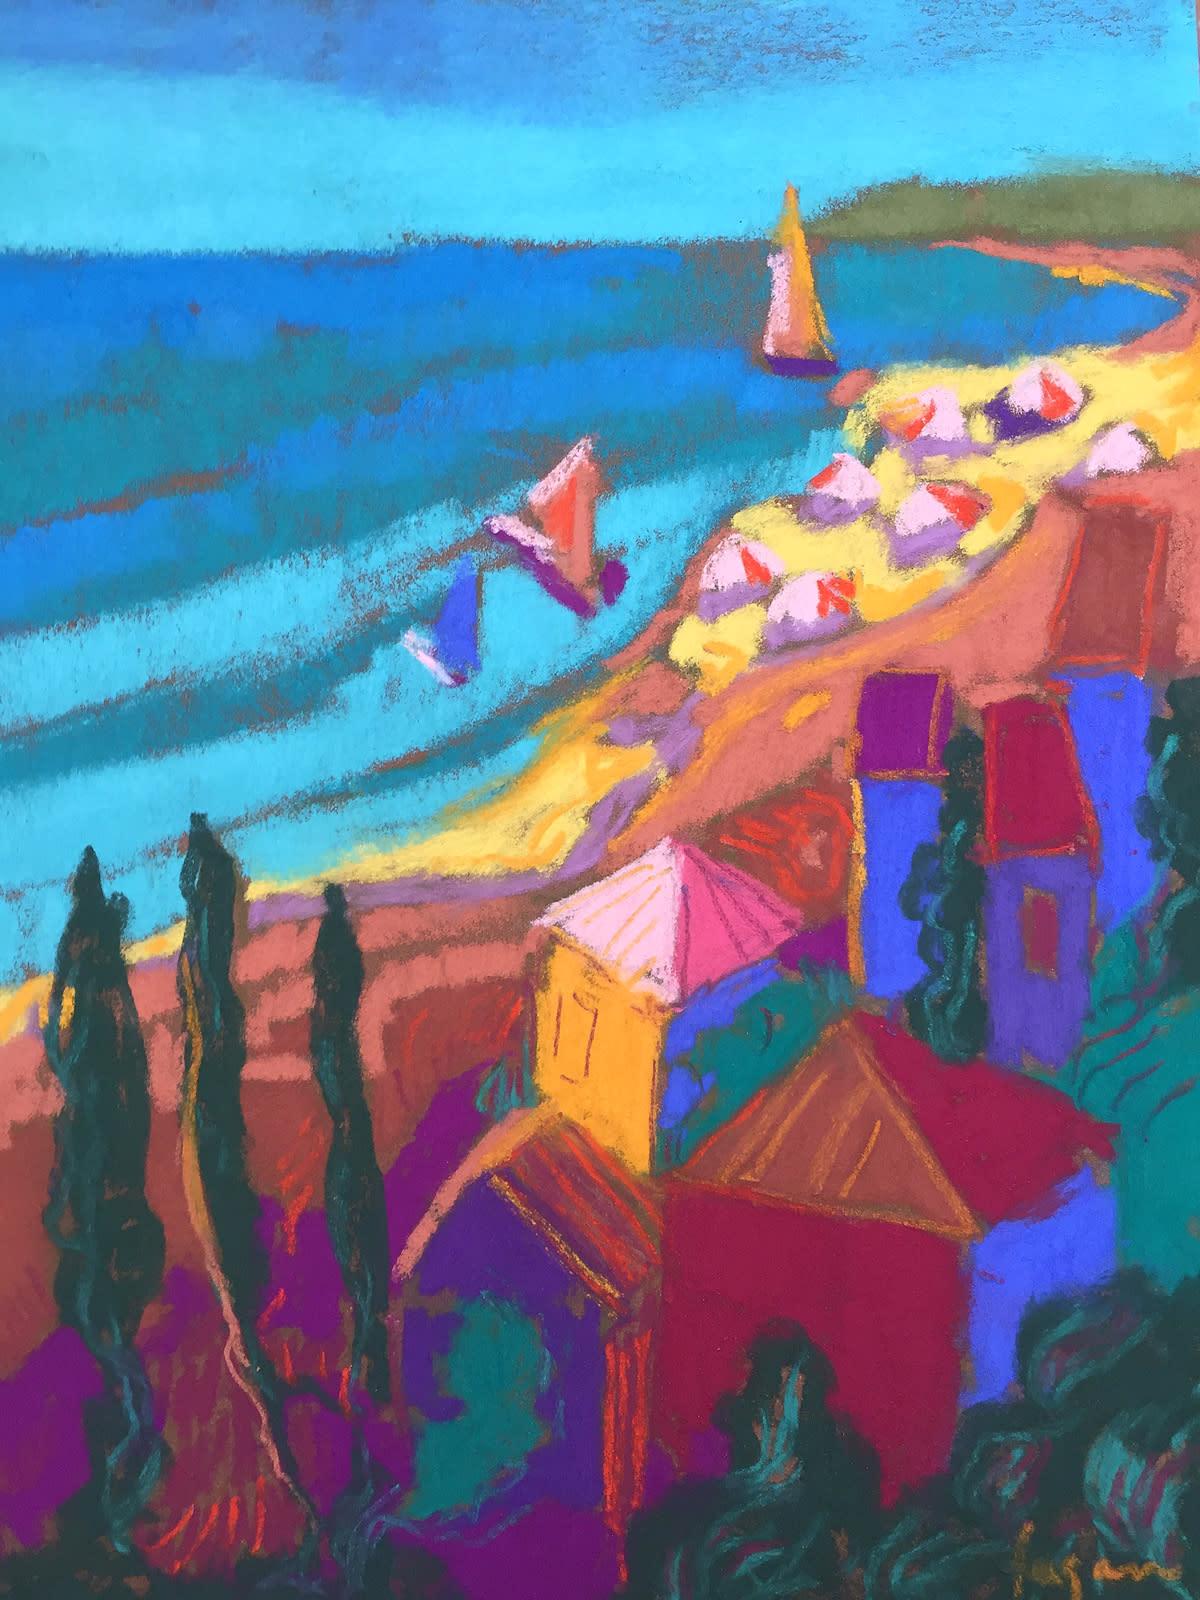 Three dreams set sail on a turquoise sea d9hhuq